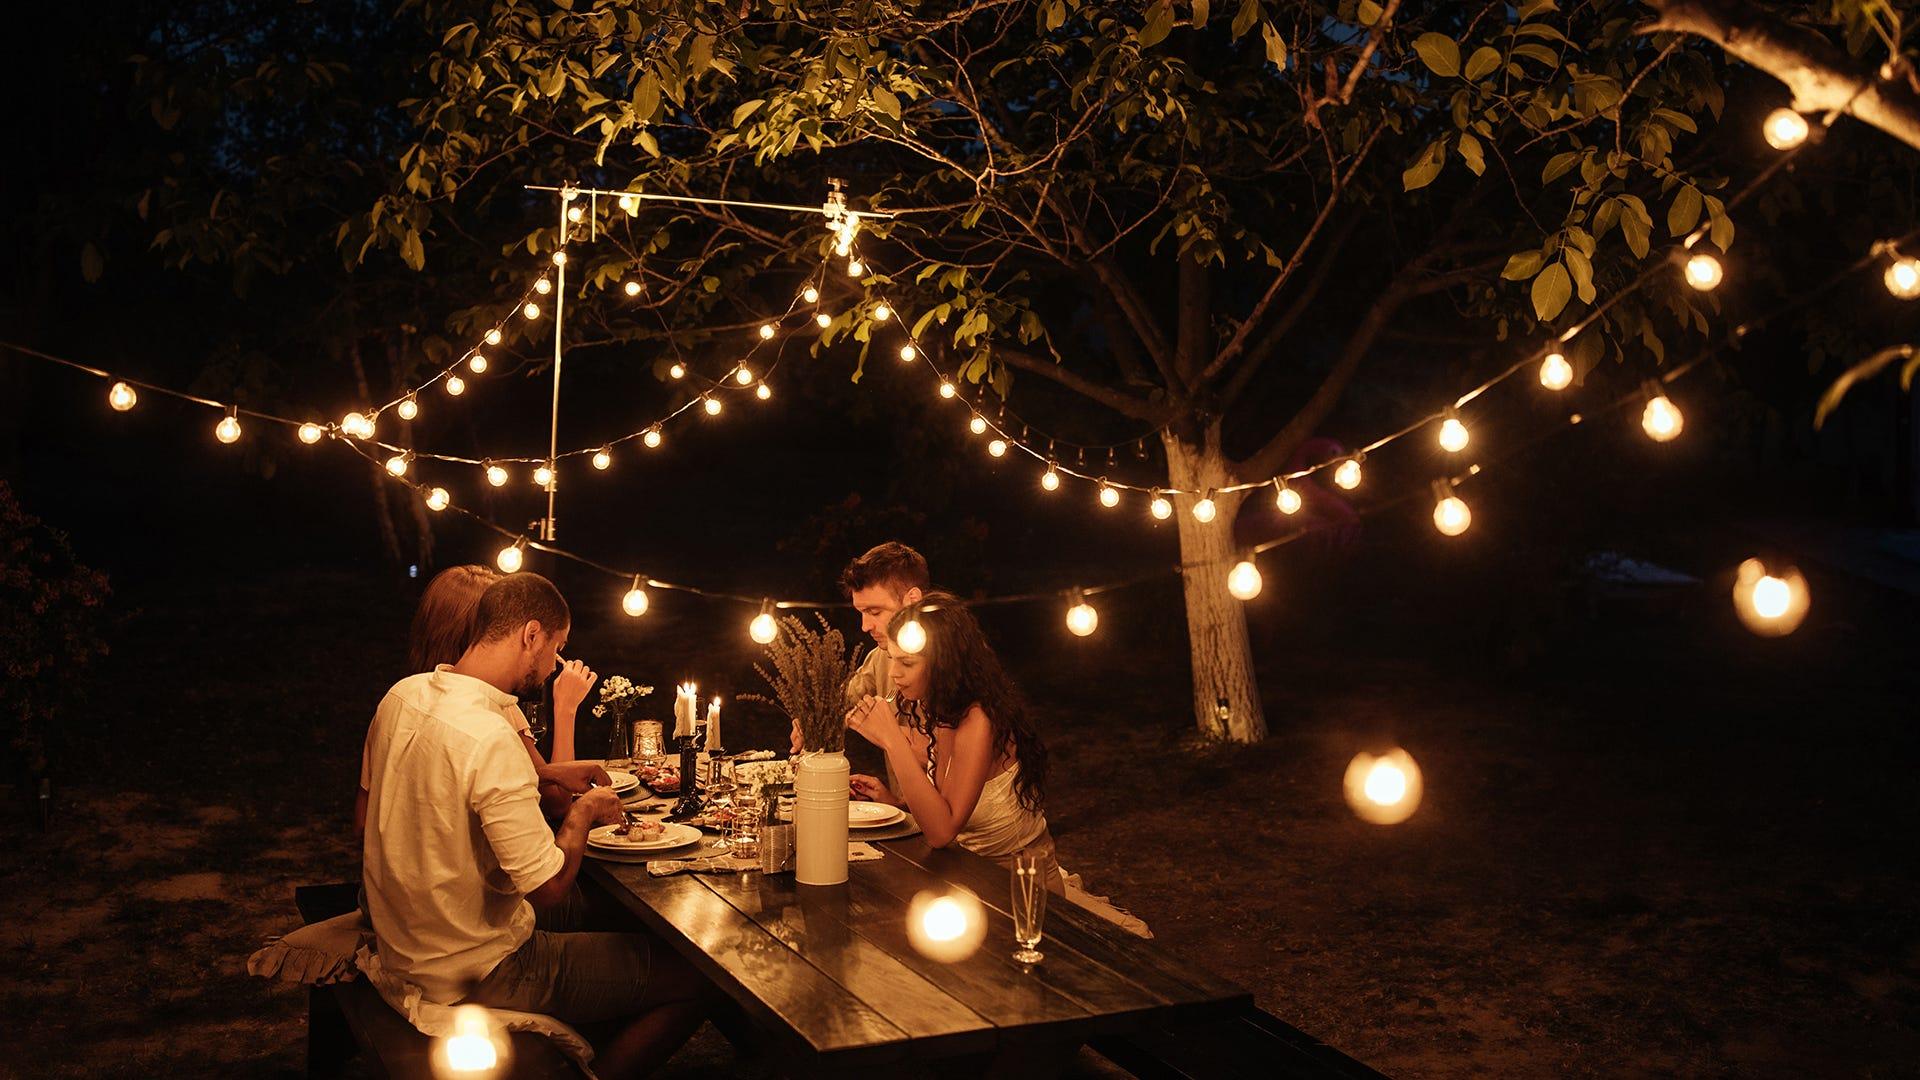 nighttime gathering without bugs